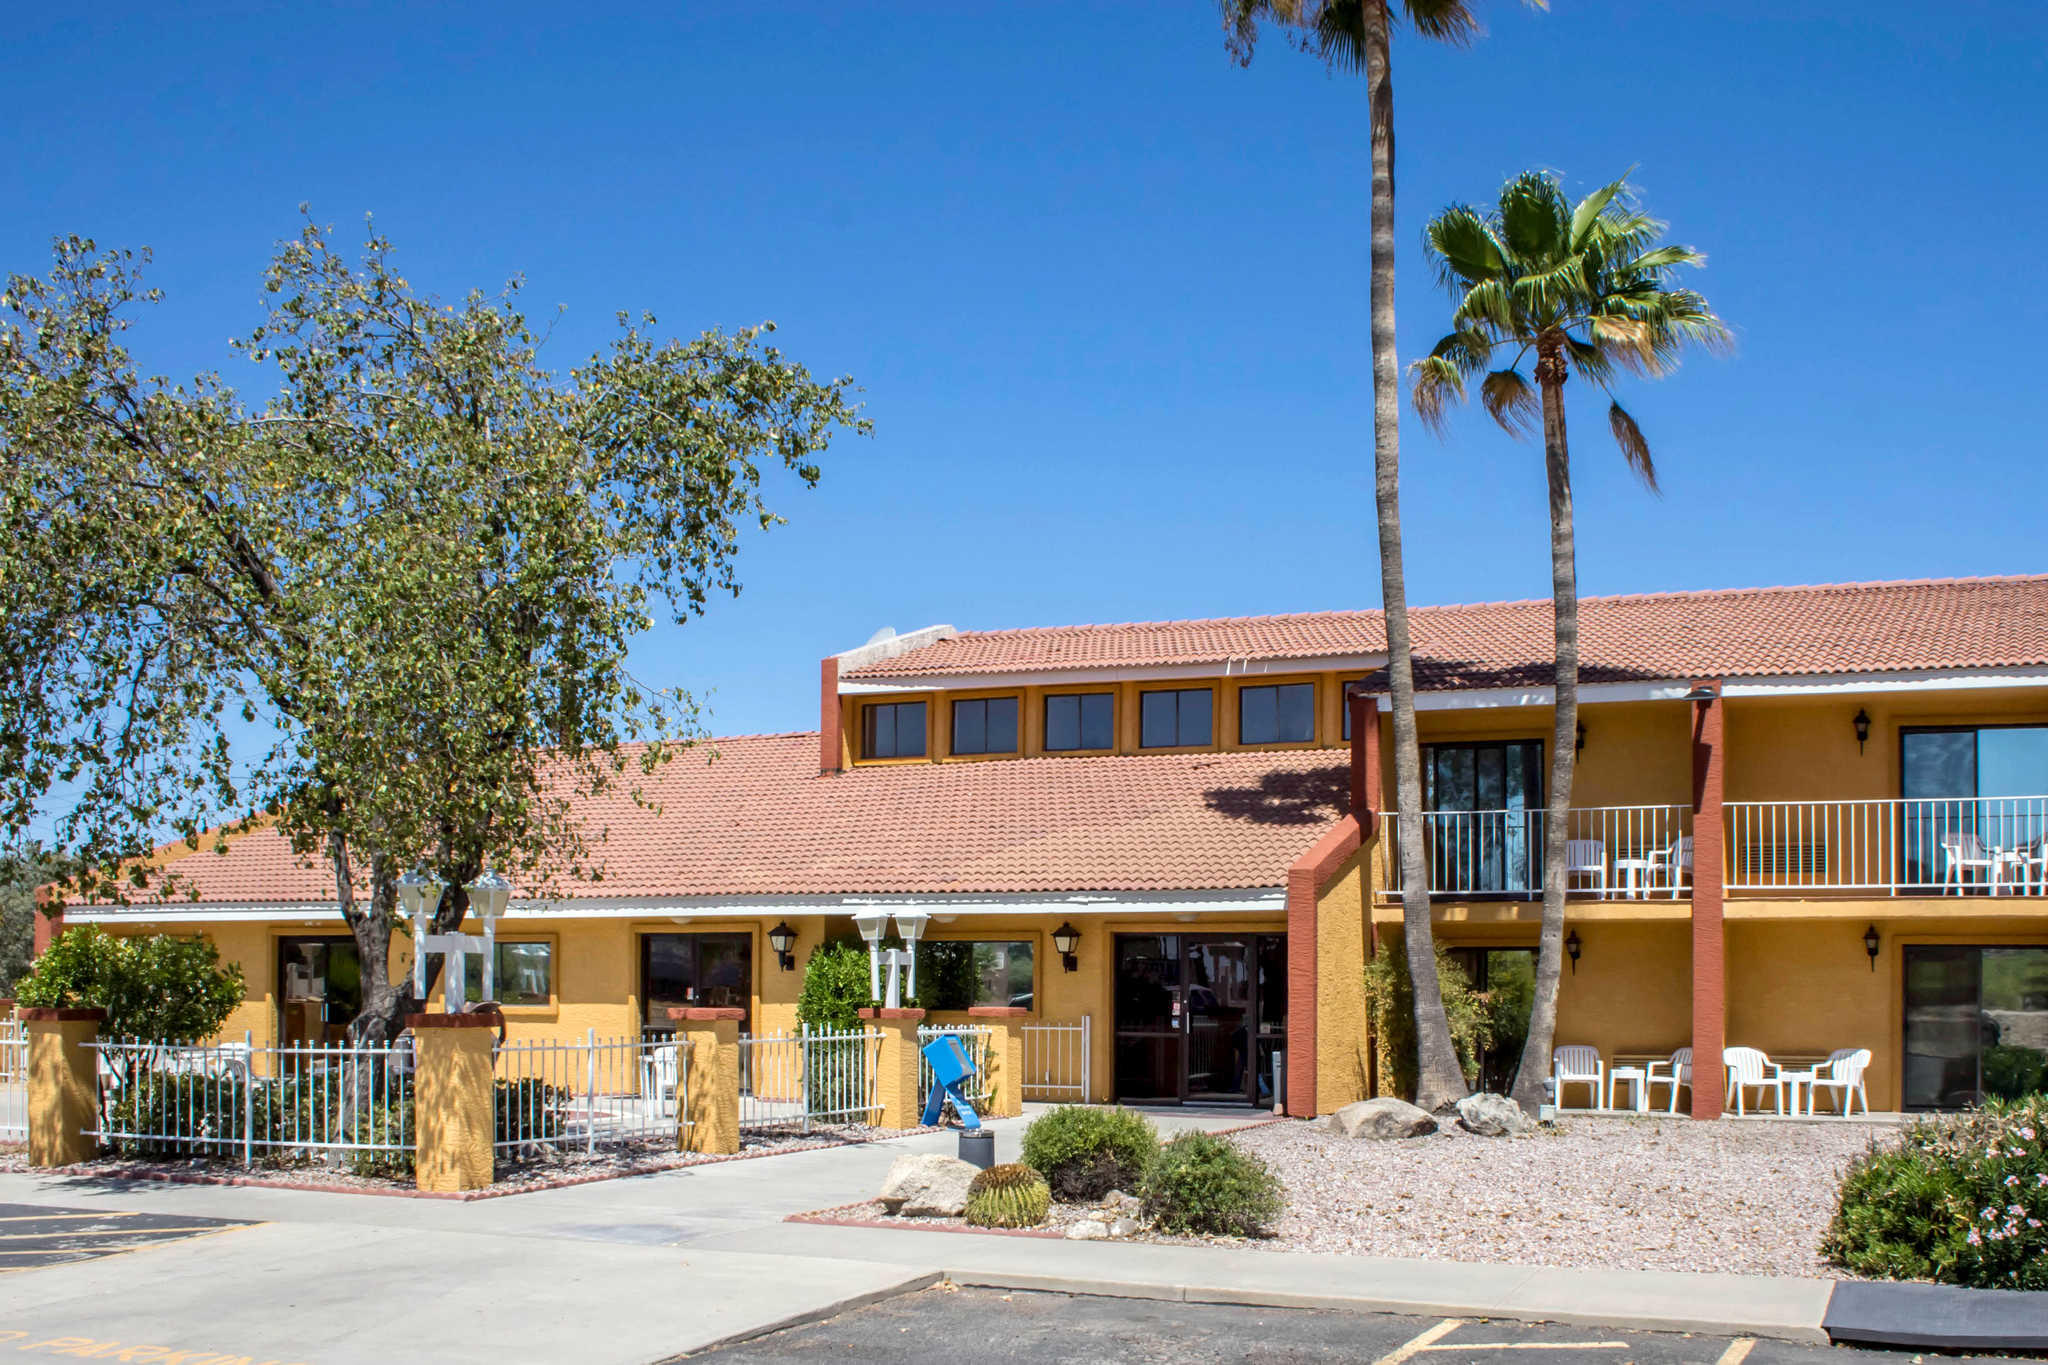 Quality Inn, Wickenburg Arizona (AZ) - LocalDatabase.com